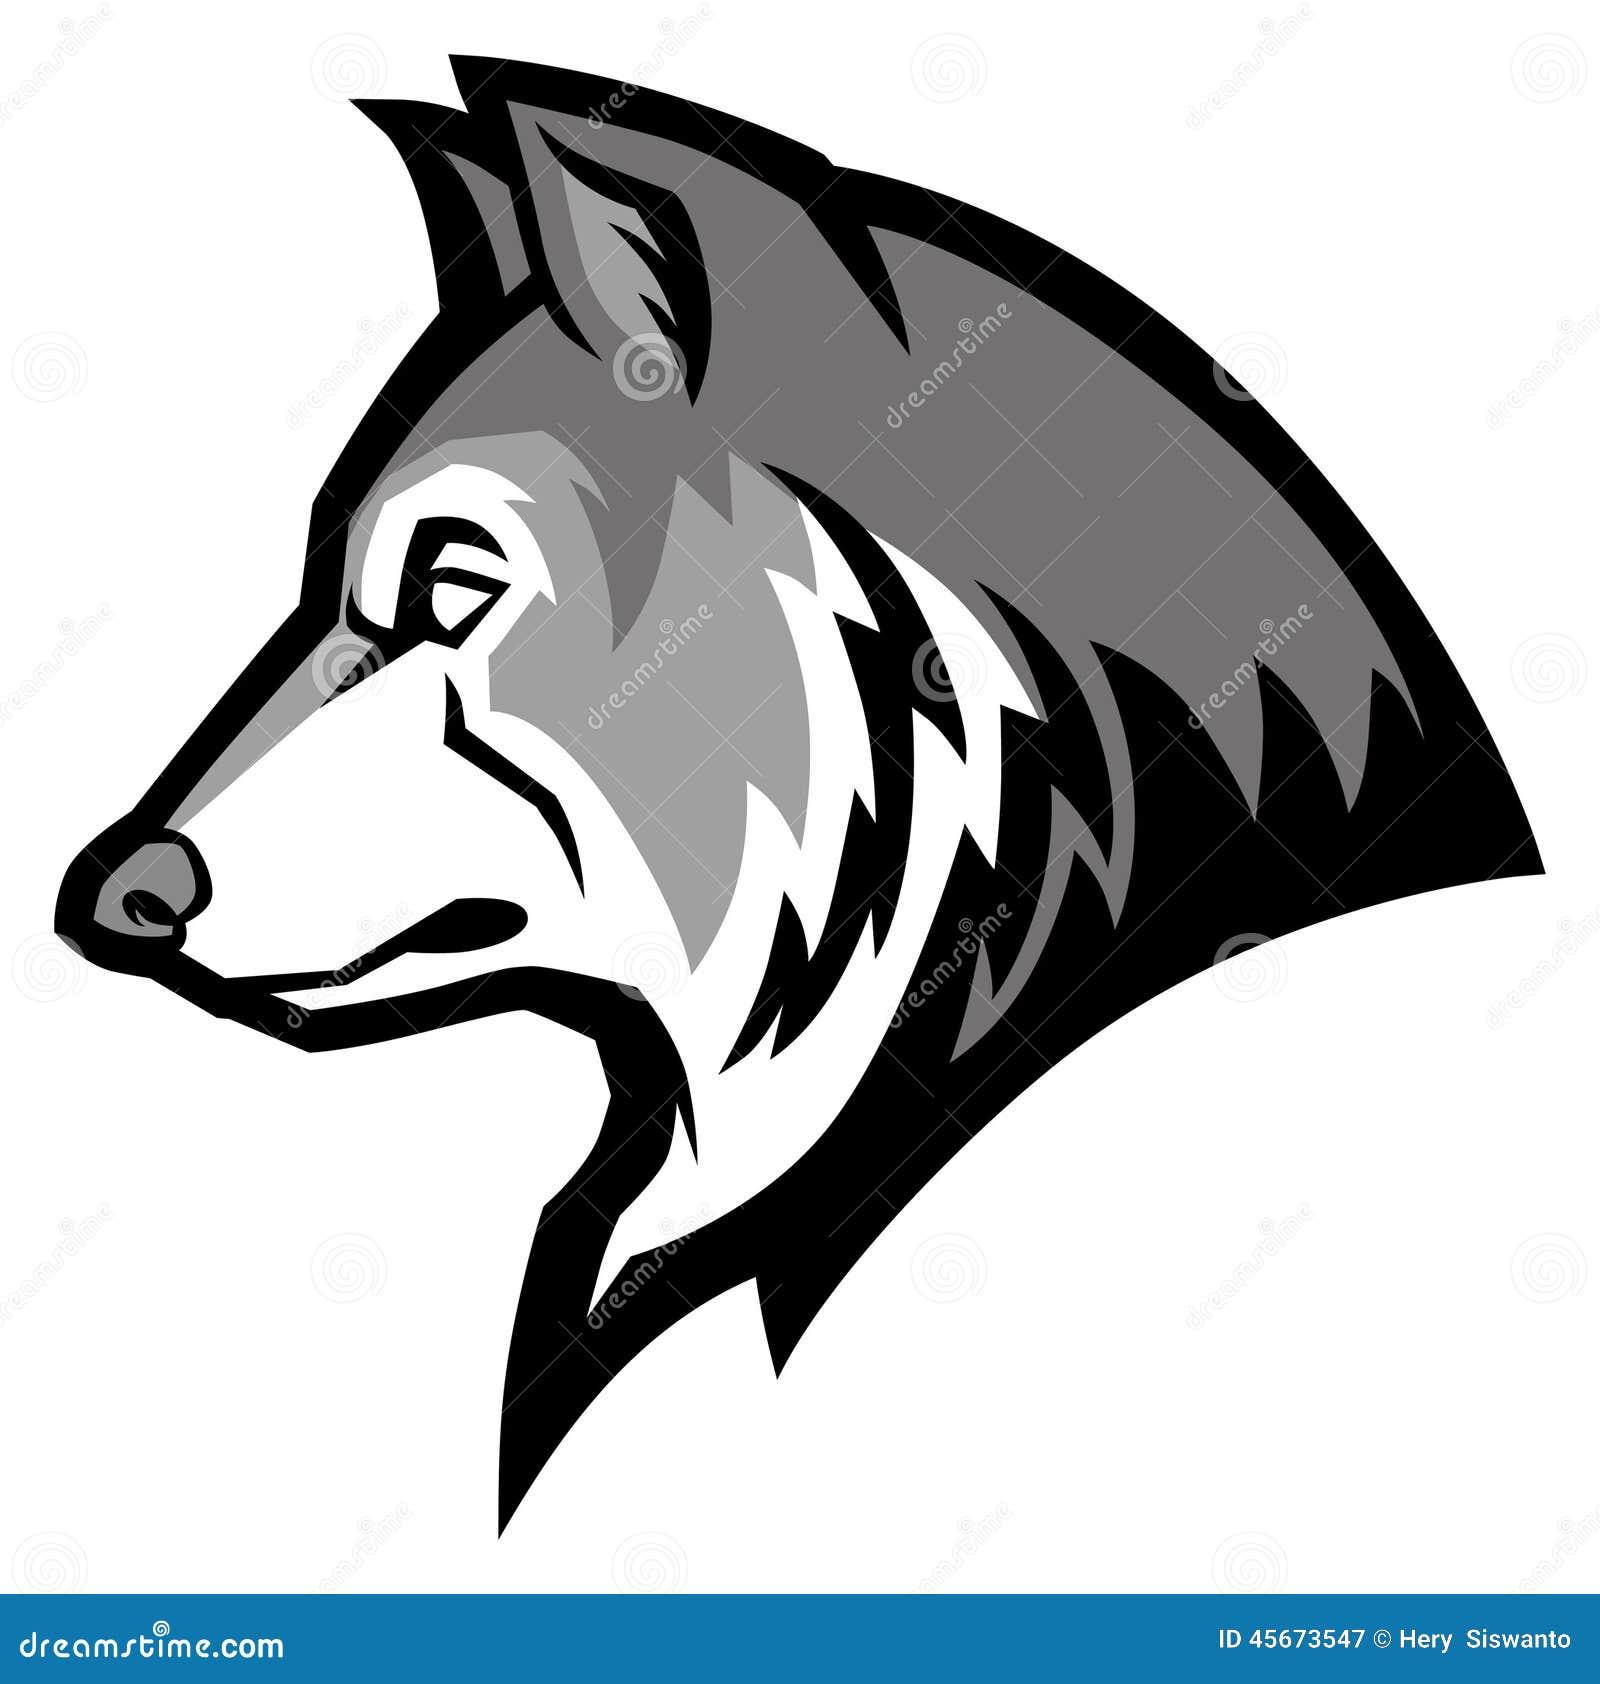 Wolf Mascot Stock Vector - Image: 45673547